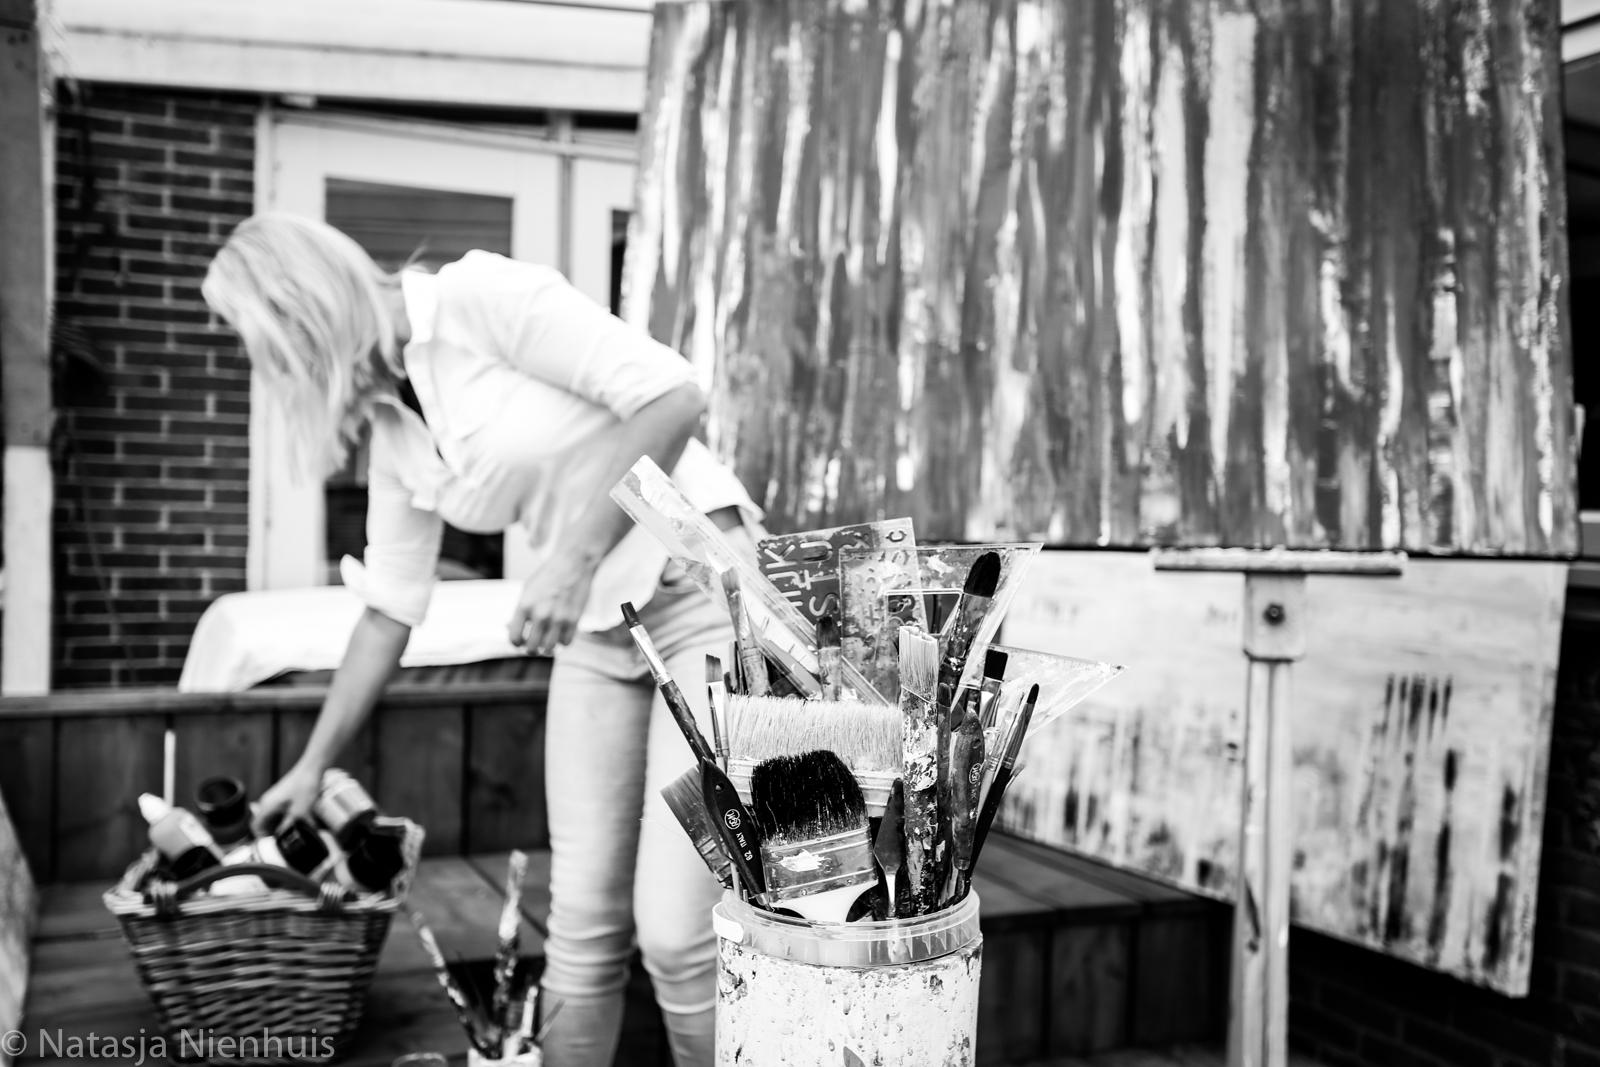 Olja_Natasja_Nienhuis_Fotografie-1003.jpg